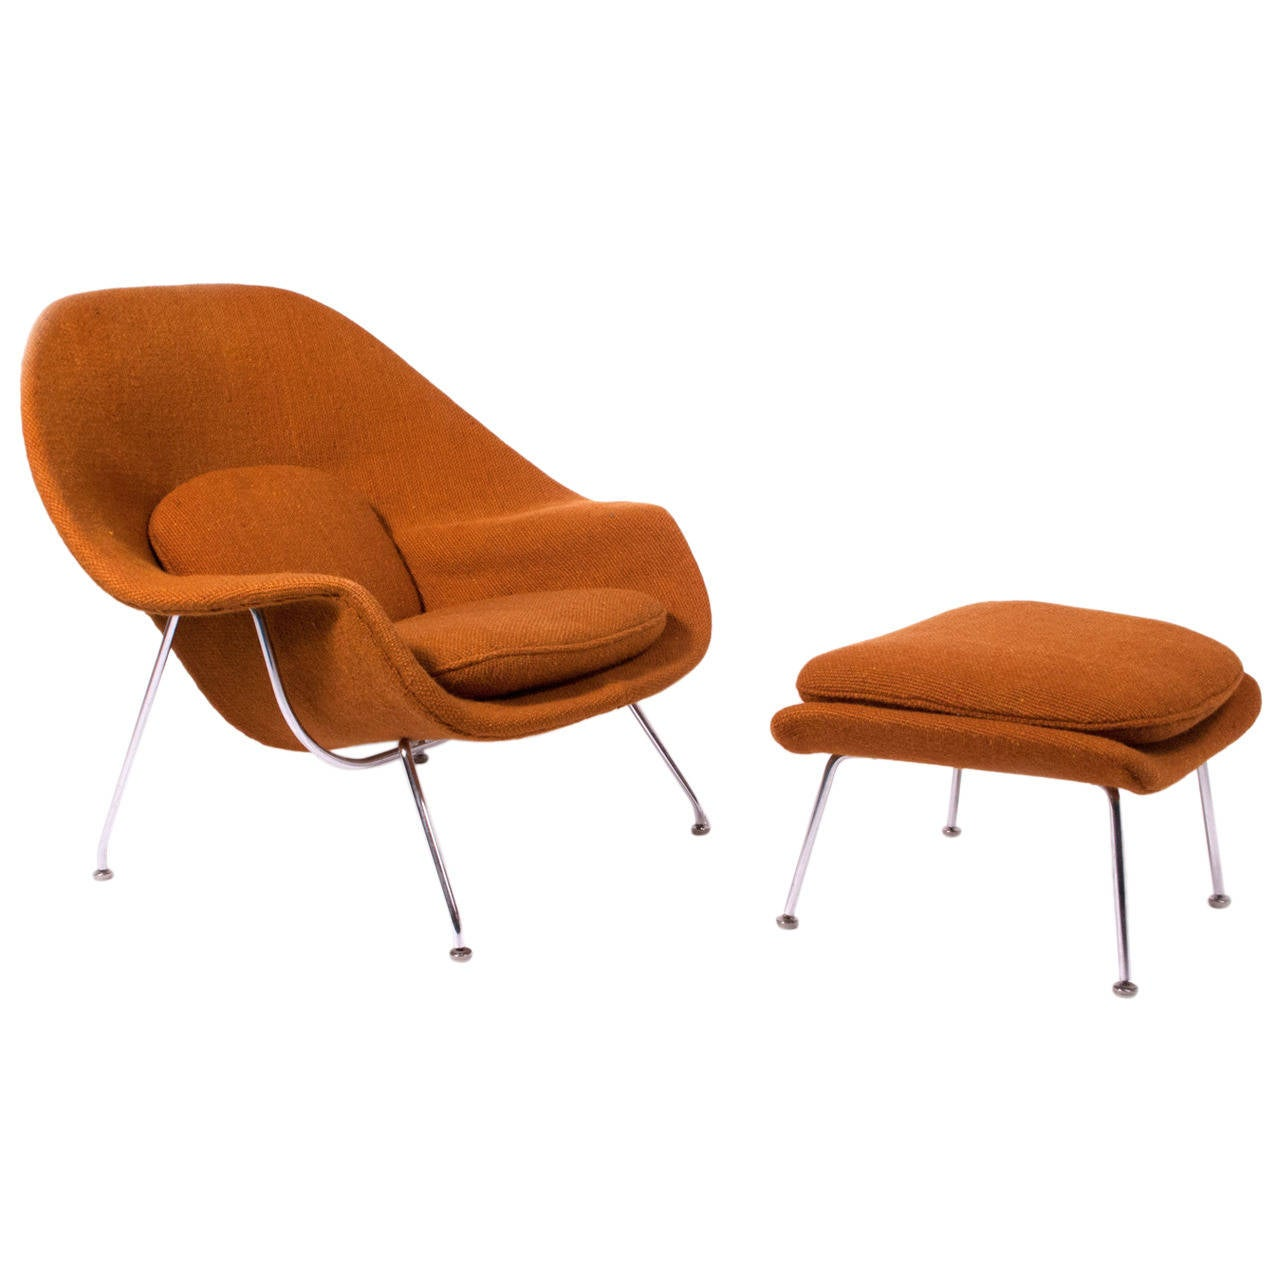 70 Womb Chair And Ottoman By Eero Saarinen At 1stdibs